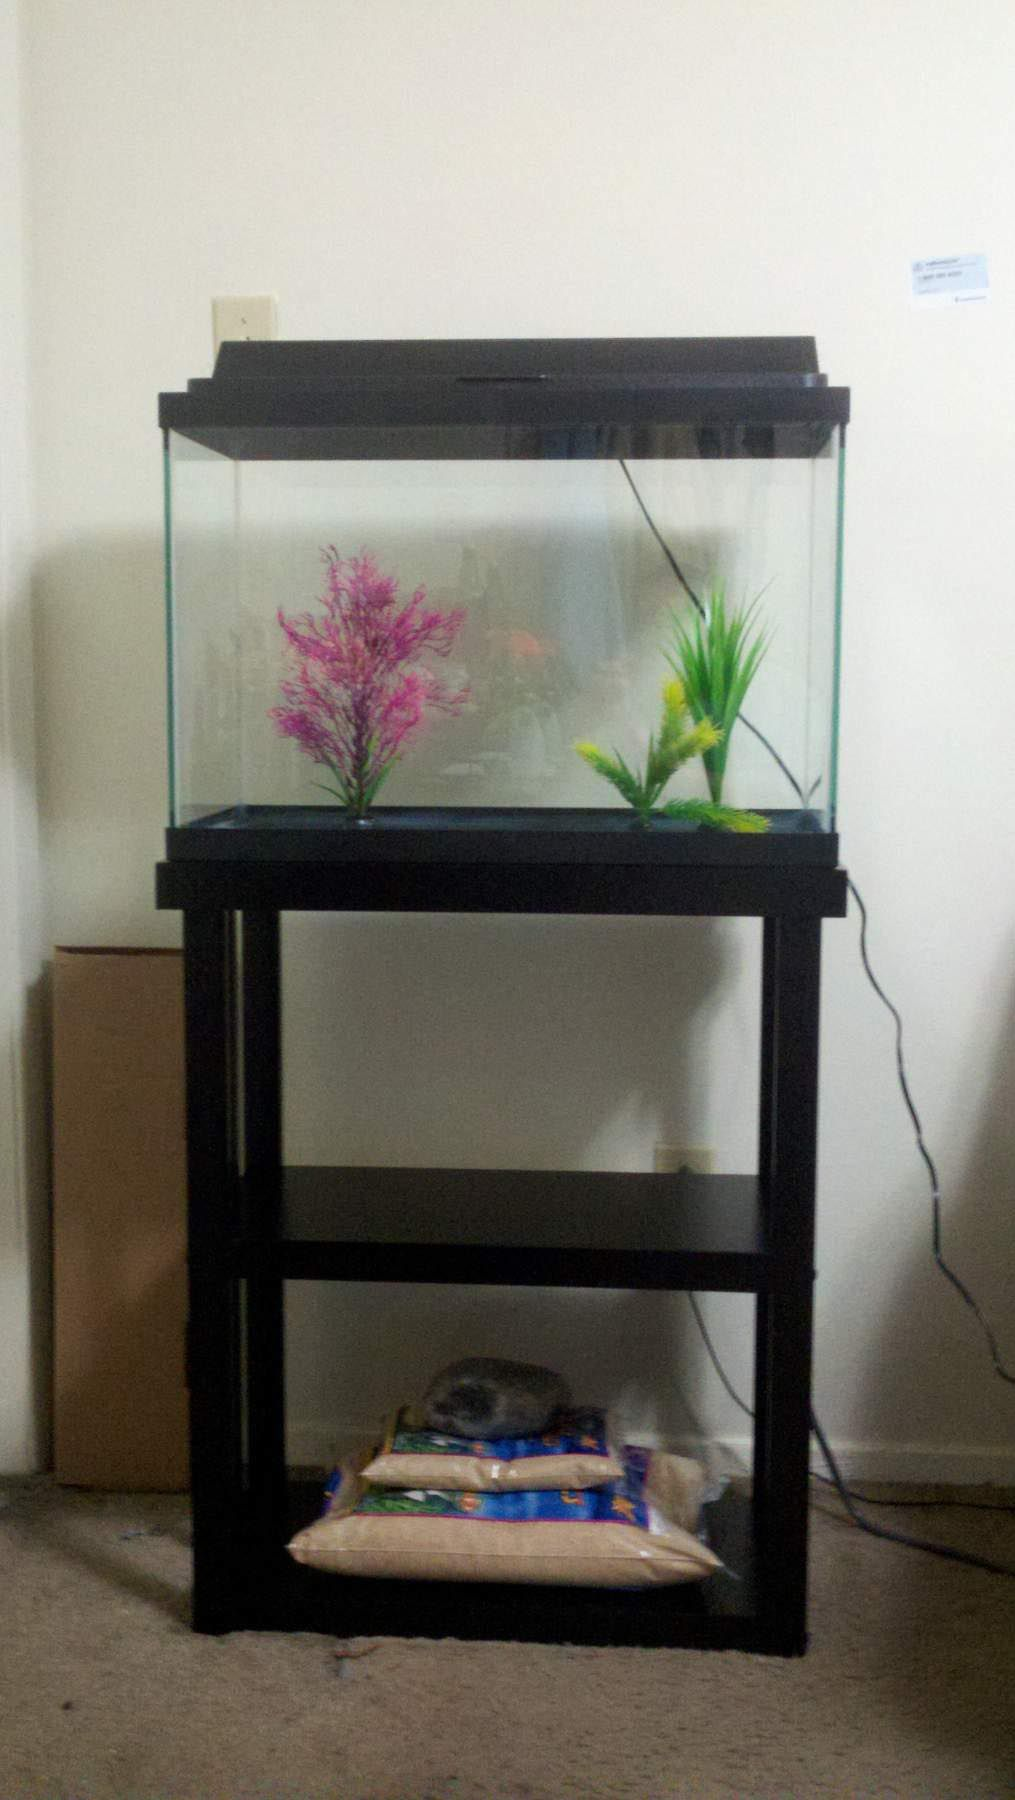 10 Gallon Fish Tank Stand Ideas For Your Aquarium Acuario Living